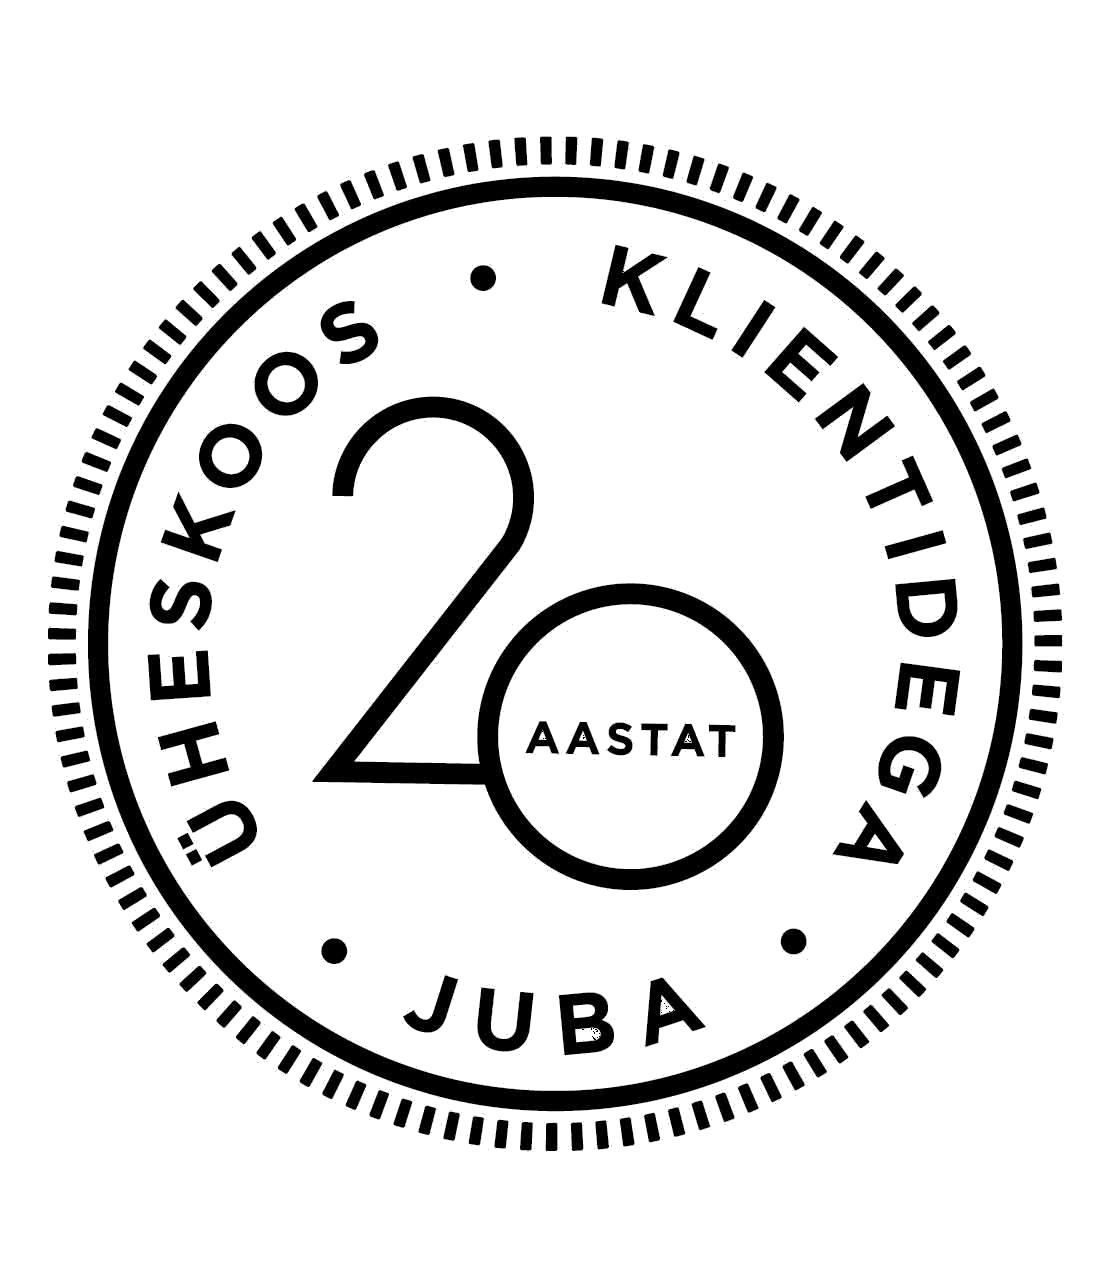 20-aastat-ab-textile-ou